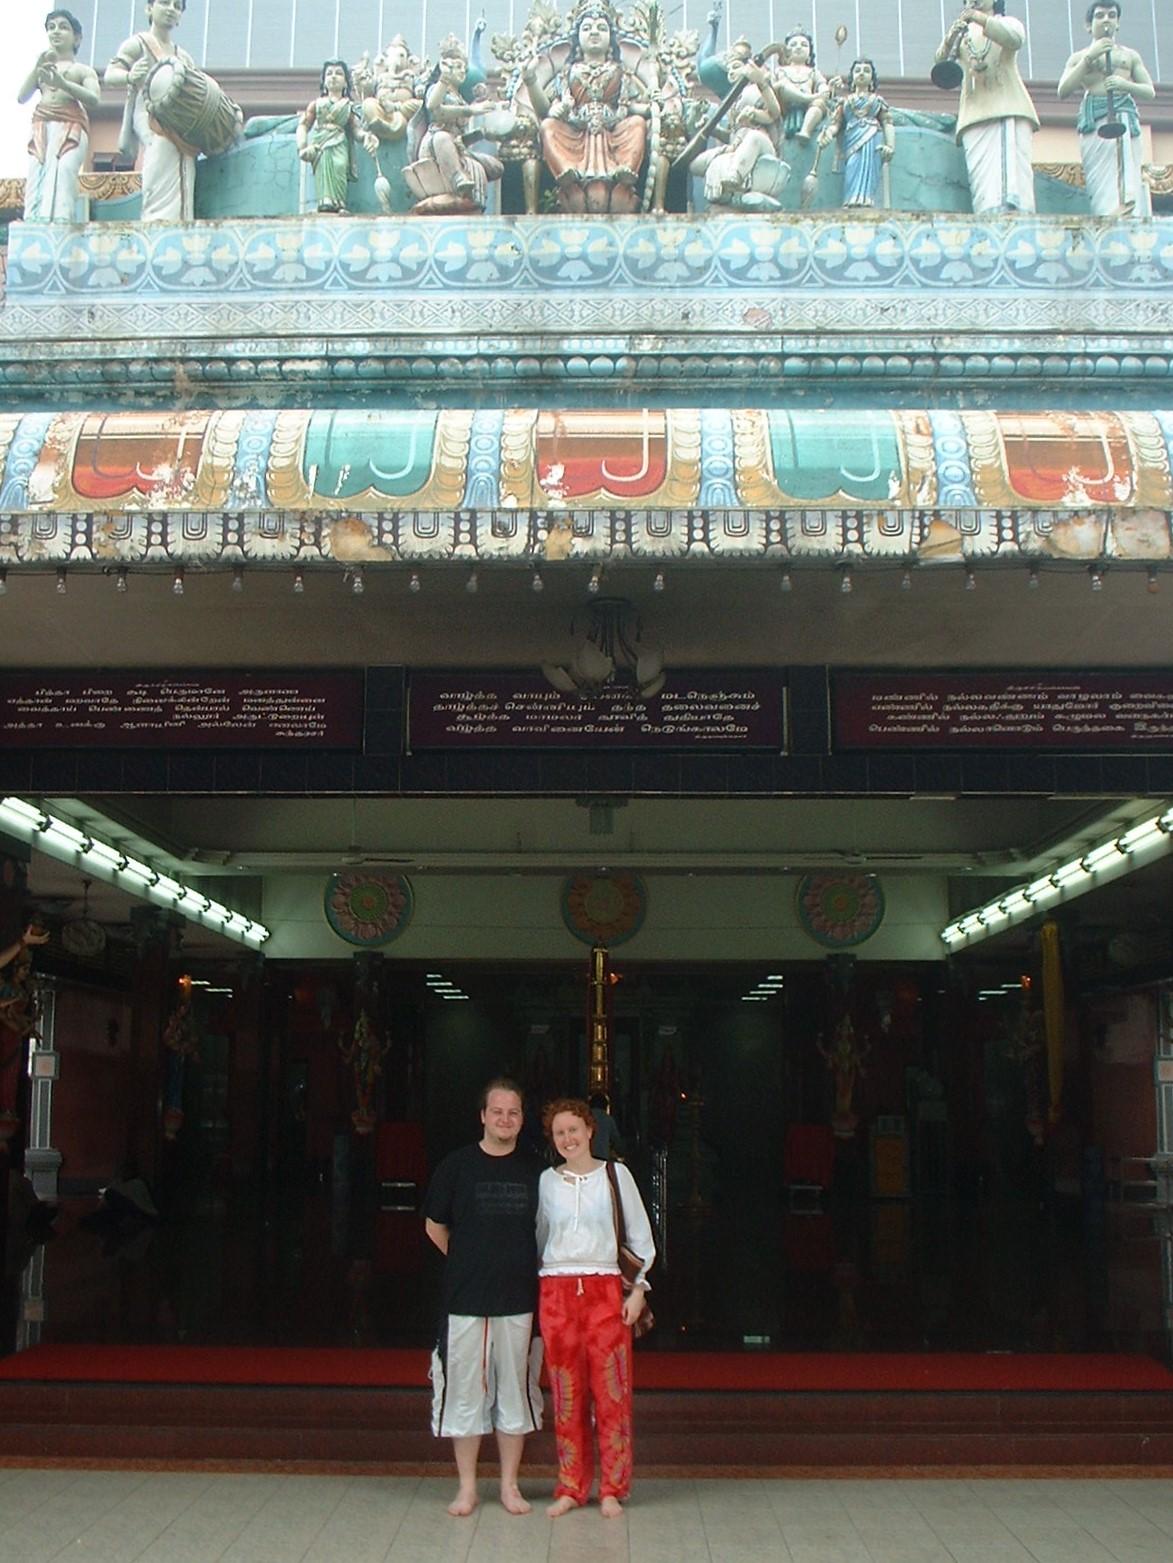 barefoot-hindu-temple-kuala lumpur.jpg